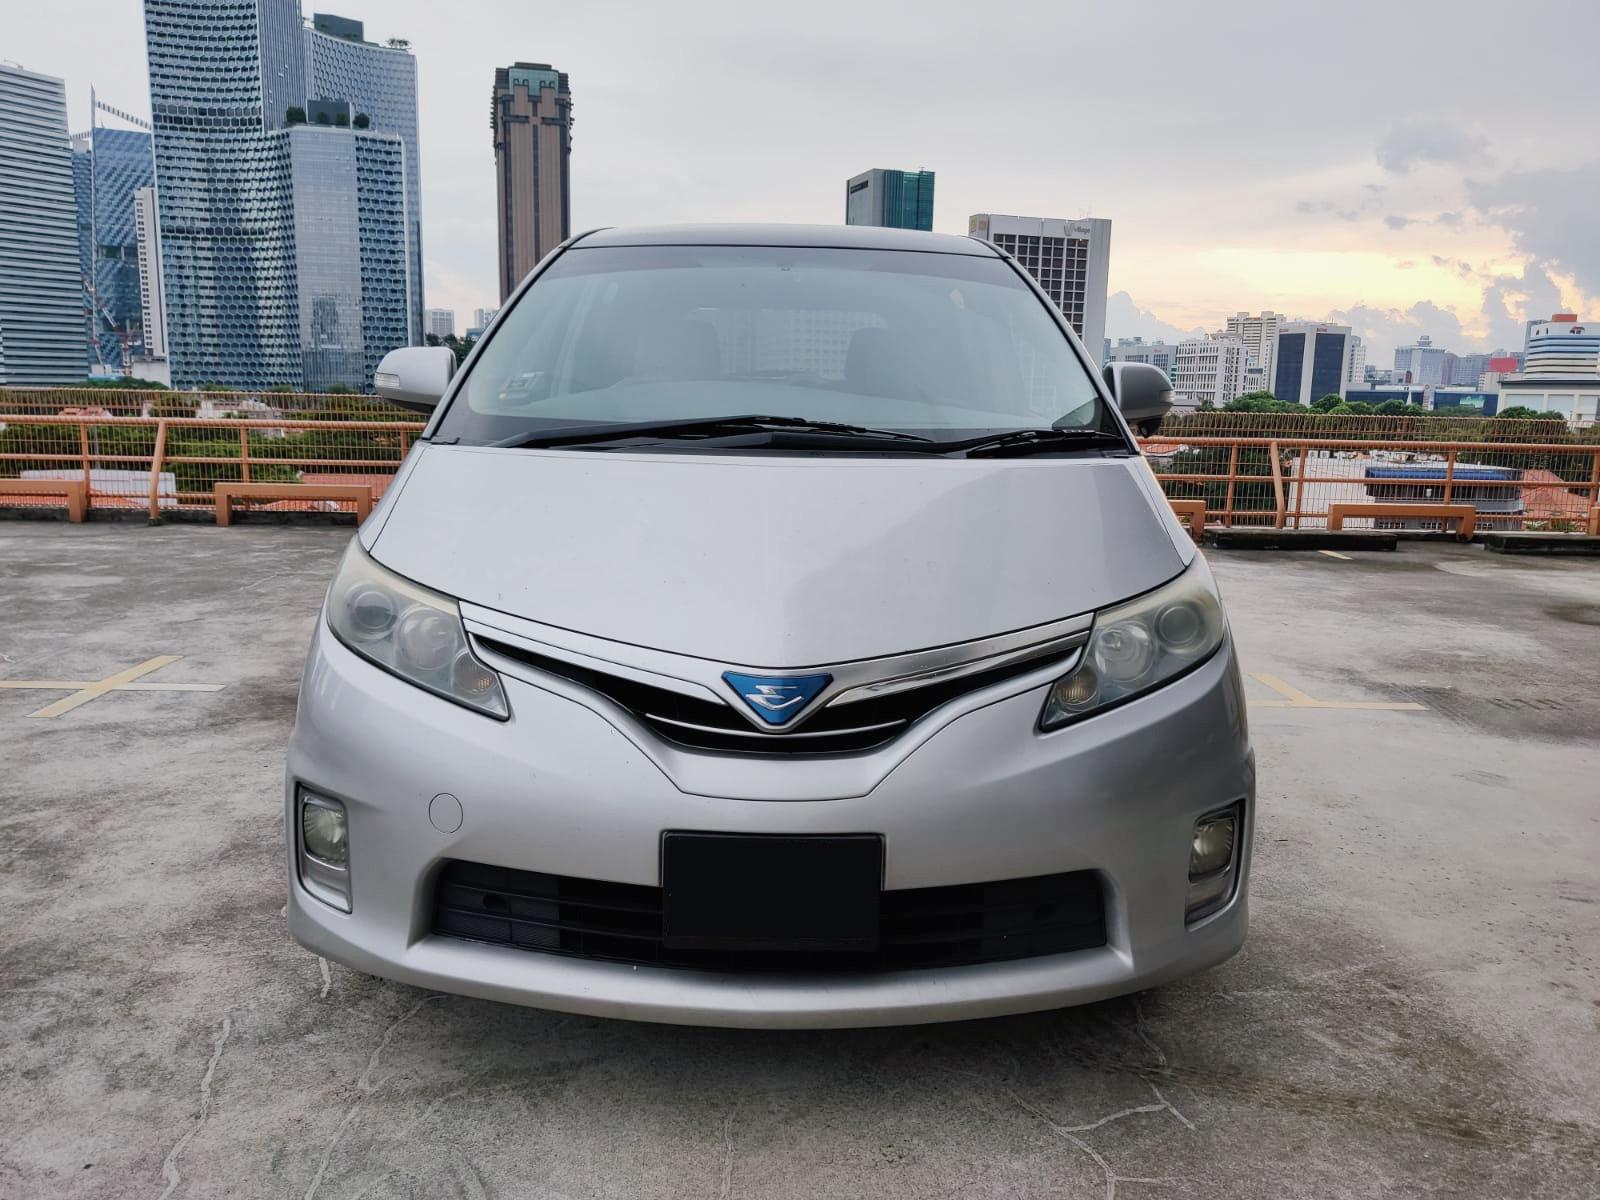 Toyota Estima Hybrid (For Lease)